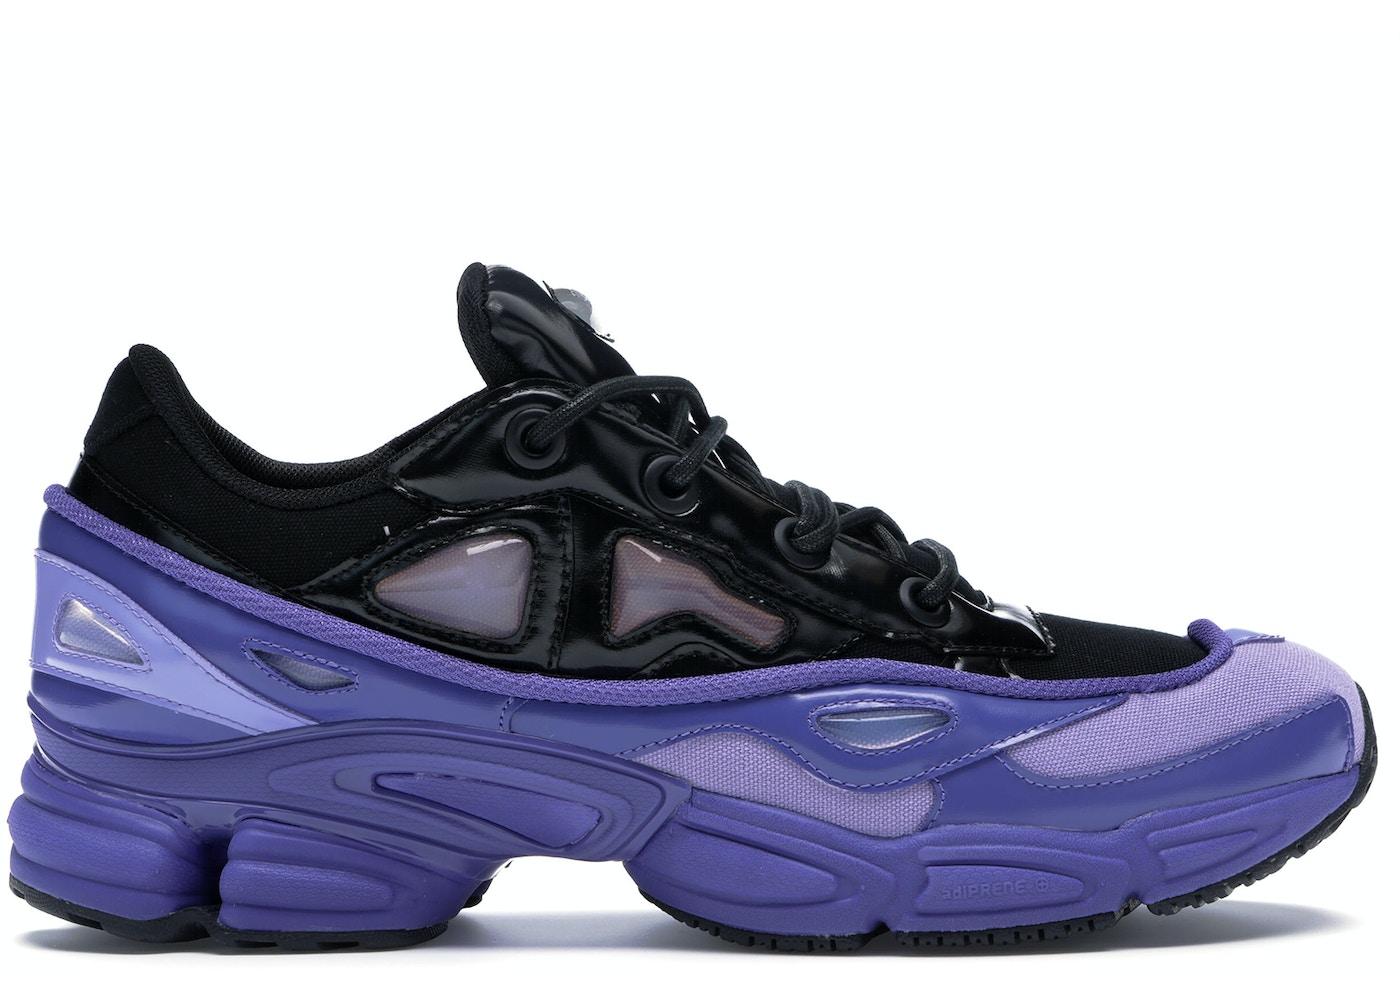 buy online 4963d 19365 adidas Ozweego 3 Raf Simons Purple Black